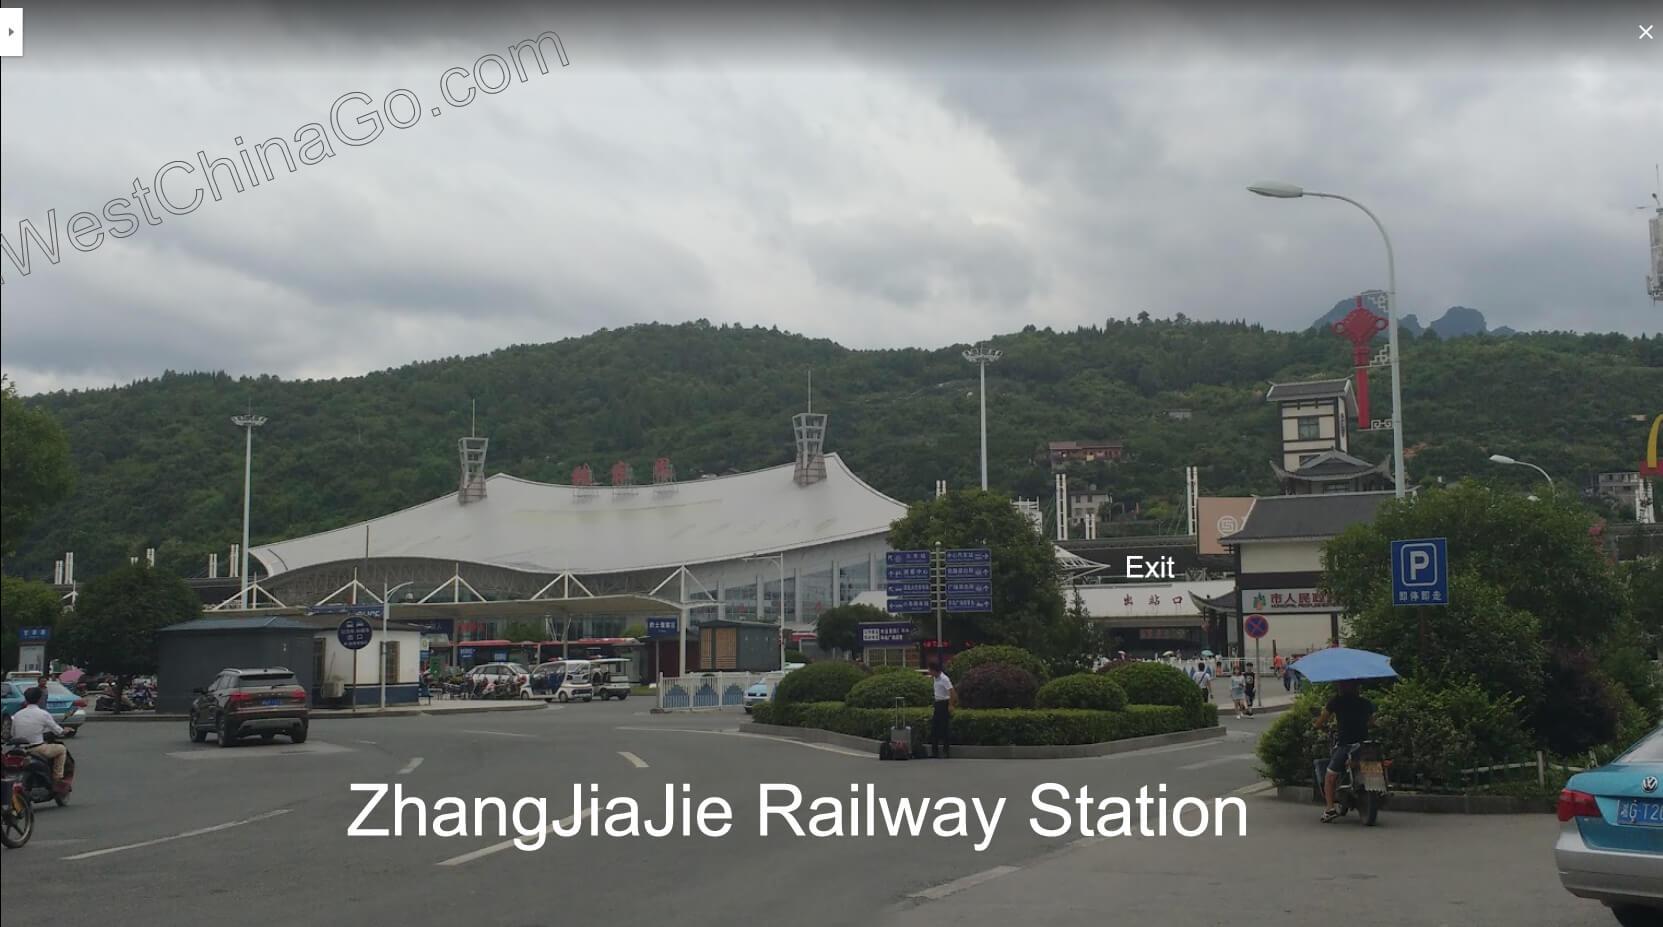 zhangjiajie railway station